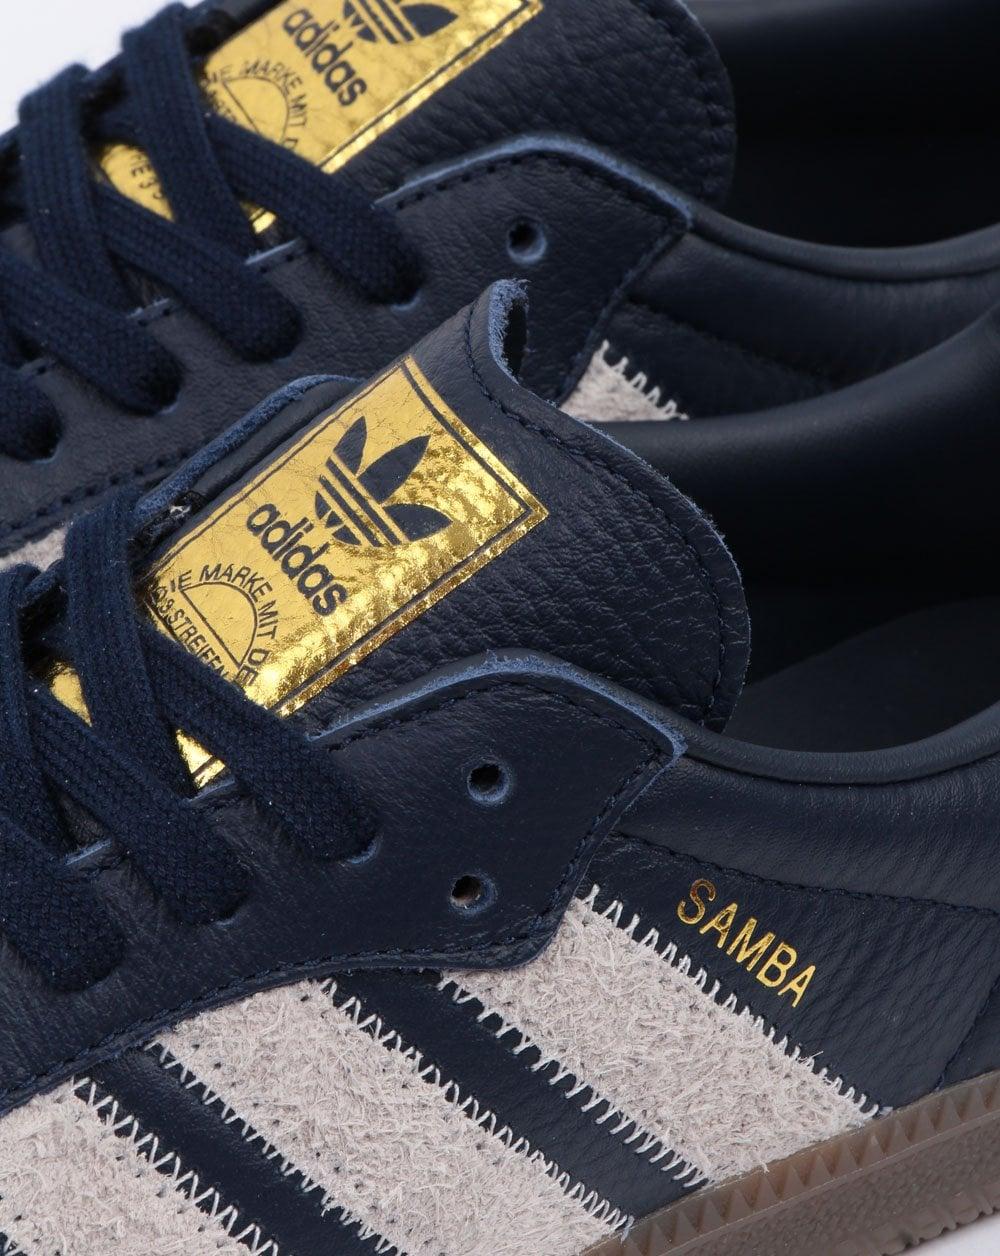 Adidas Samba Og Ft Trainers NavyGrey Adidas At 80s Casual